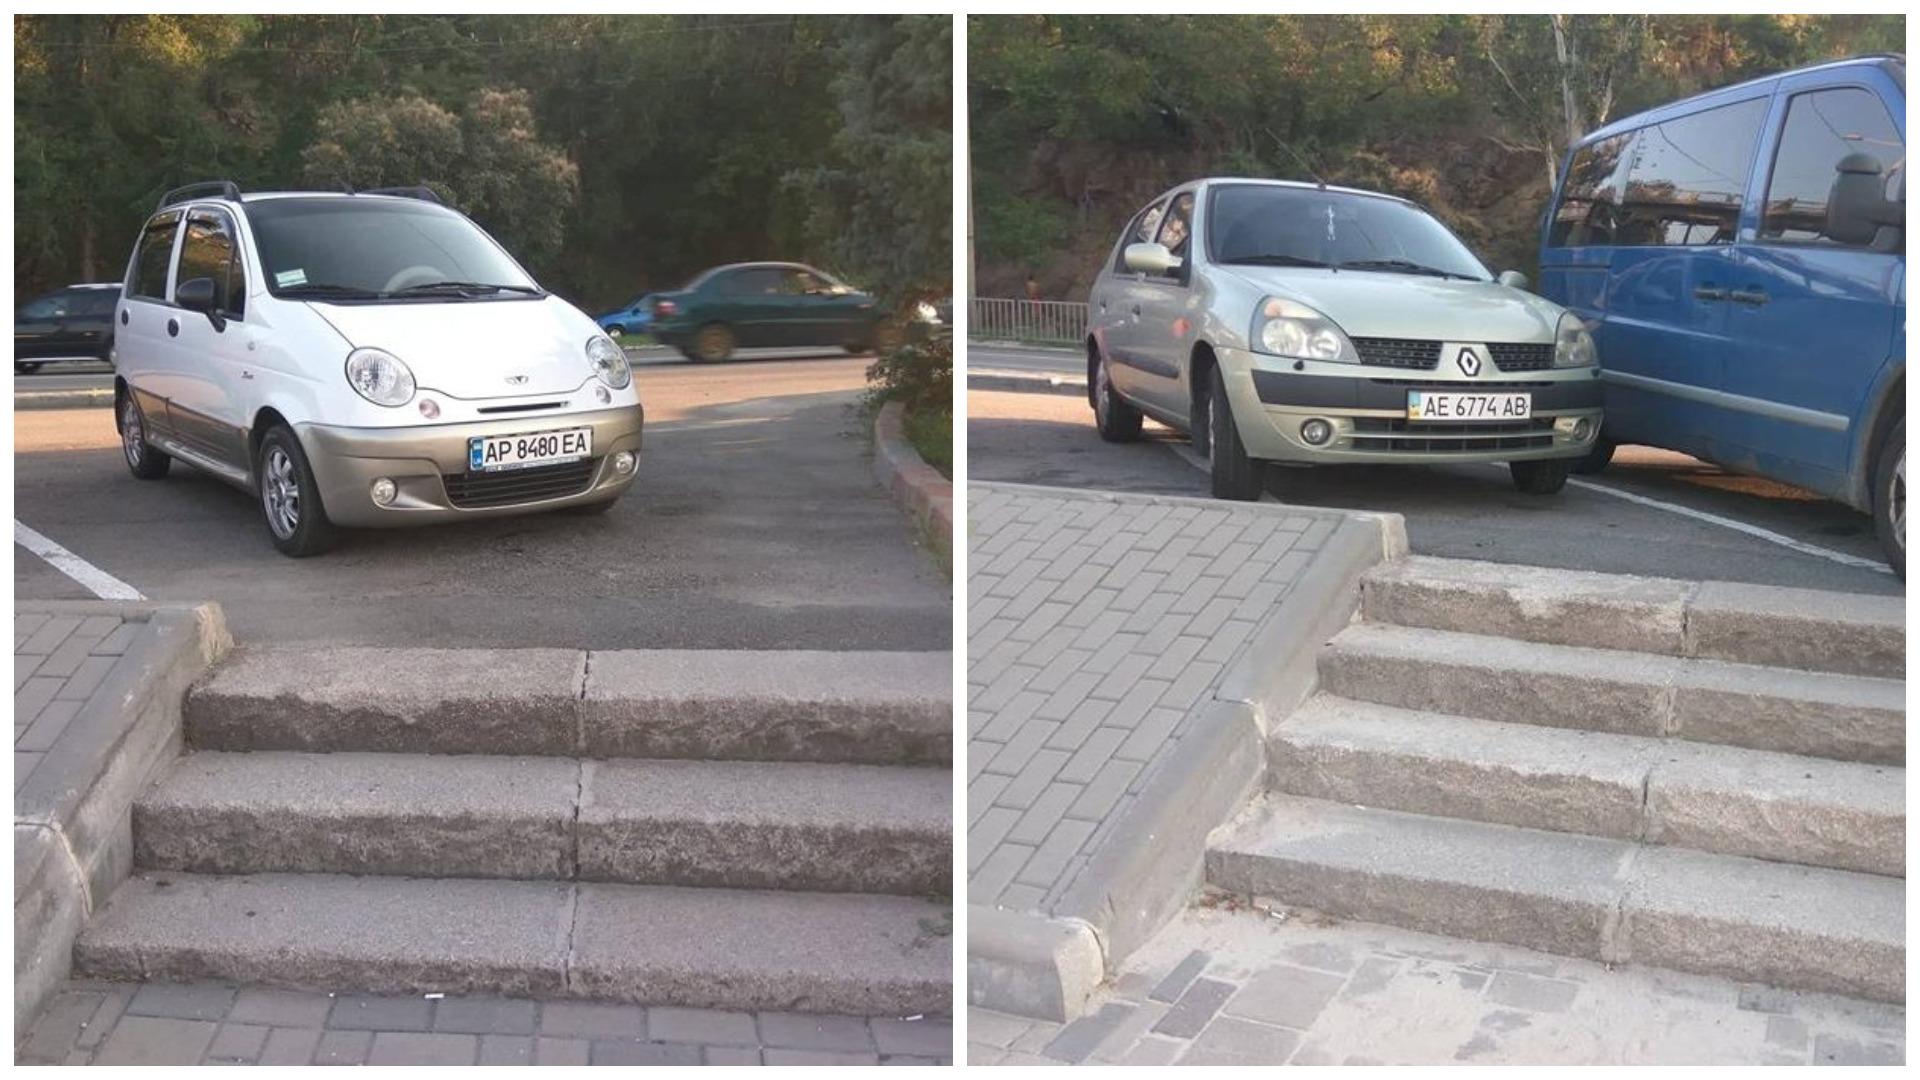 Daewoo Matiz с номером АР 8480 ЕА и Renault Clio с номером АЕ 6774 АВ